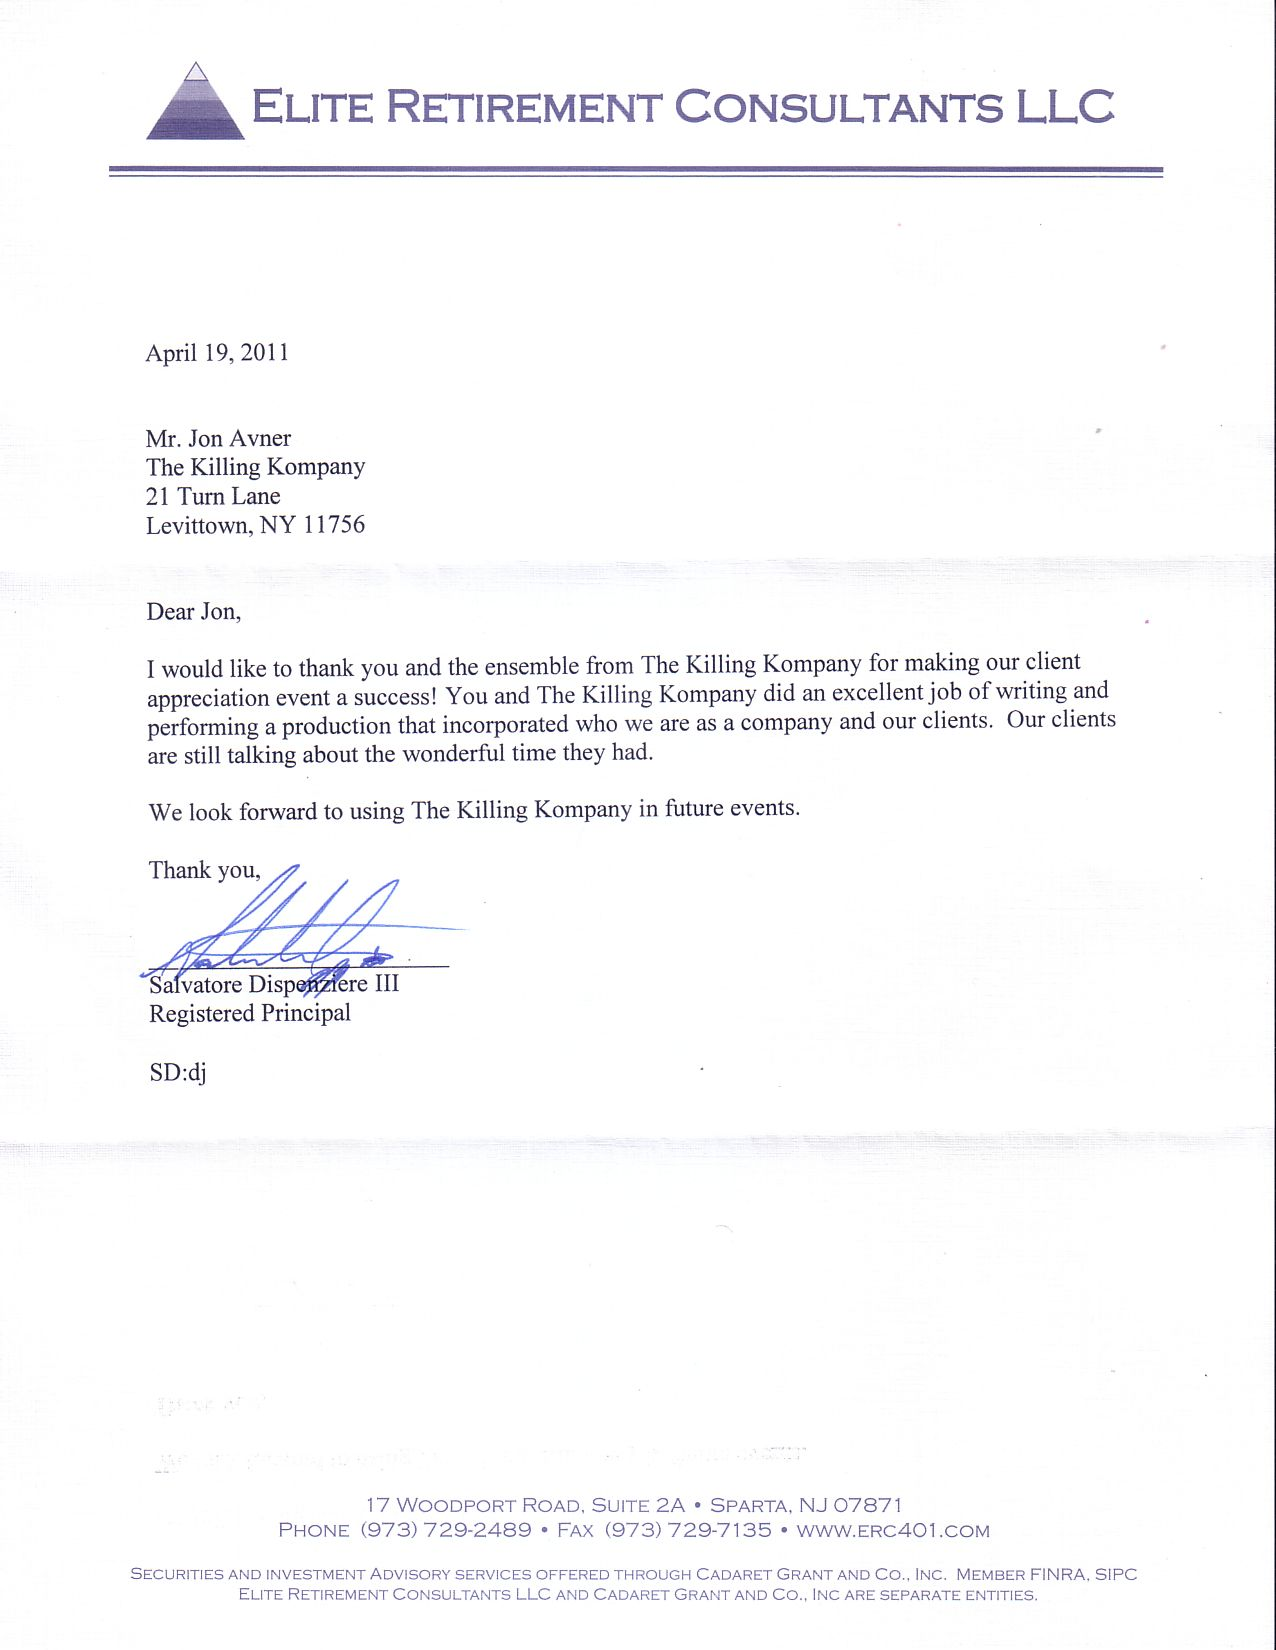 best retirement letter samples coverletter for job education best retirement letter samples retirement letter example to notify employer the balance letter format retirement the